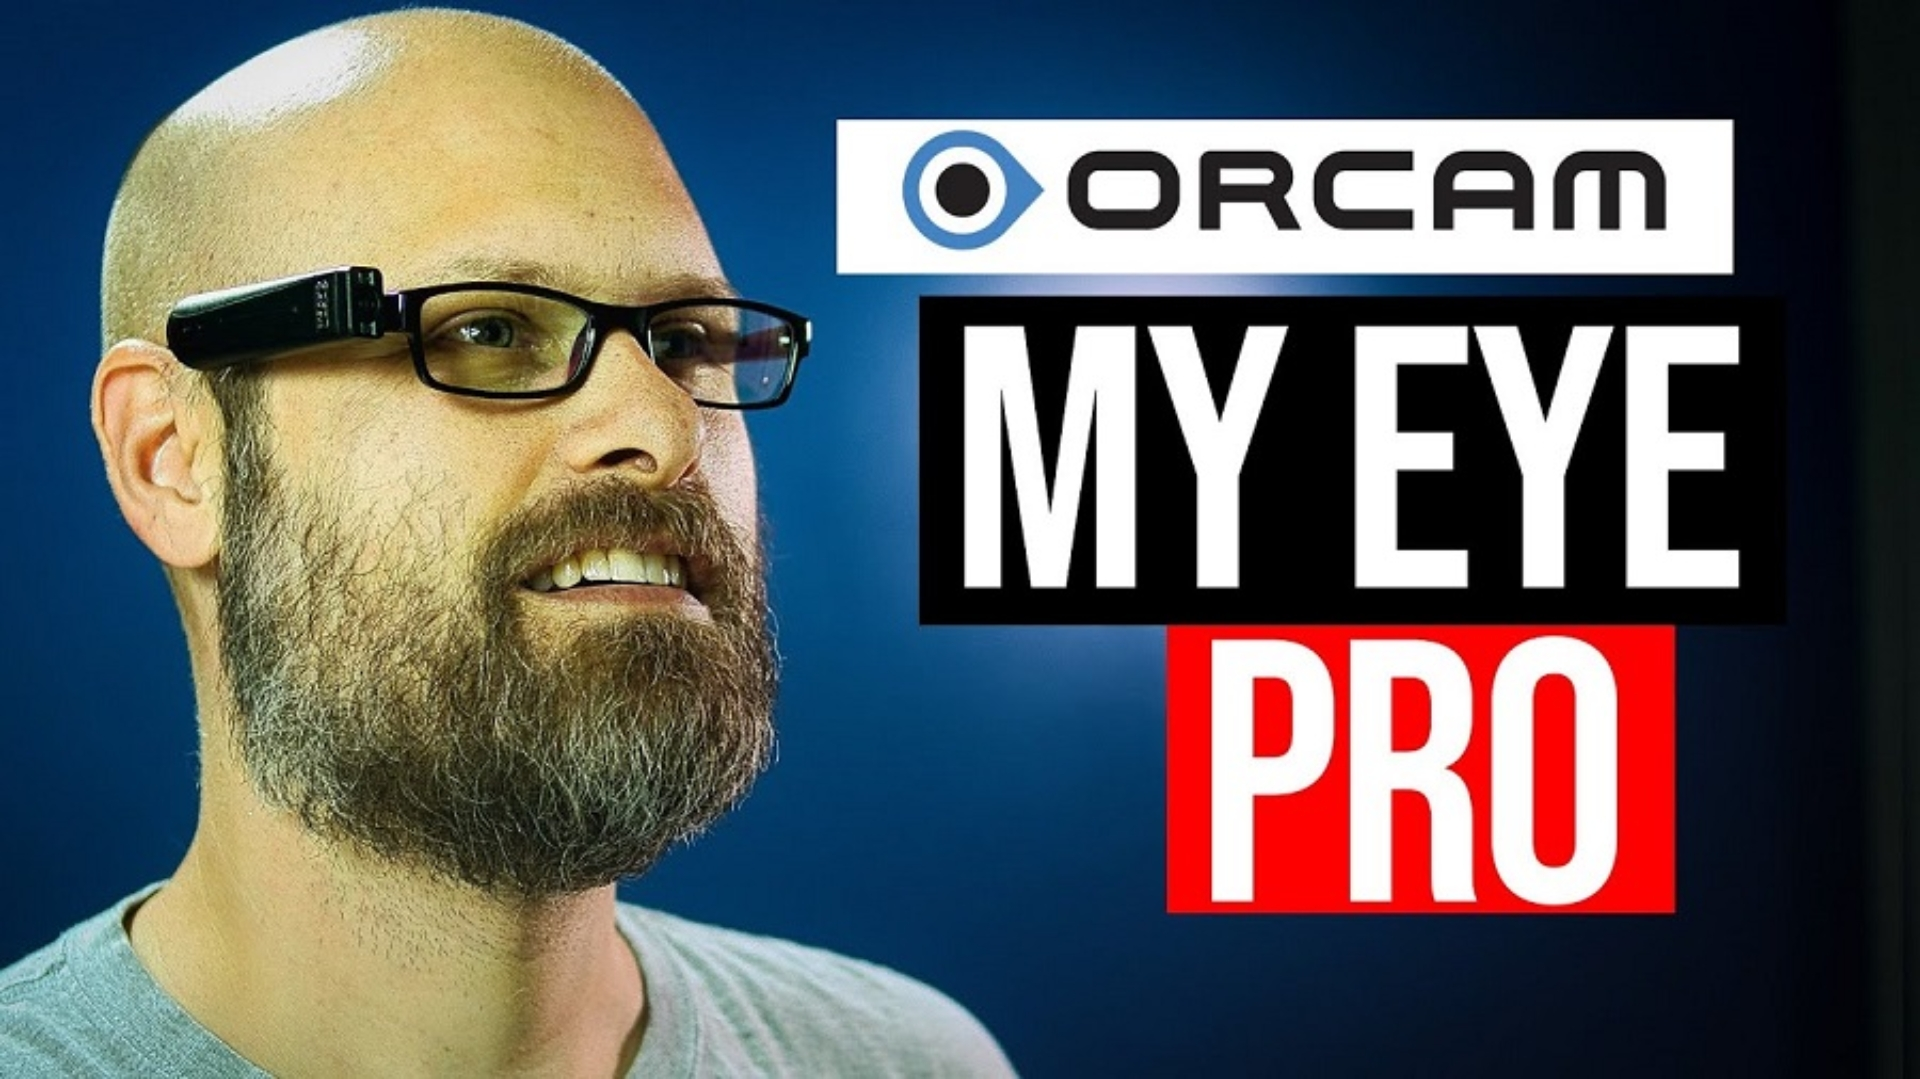 Sam wearing the OrCam My Eye Pro